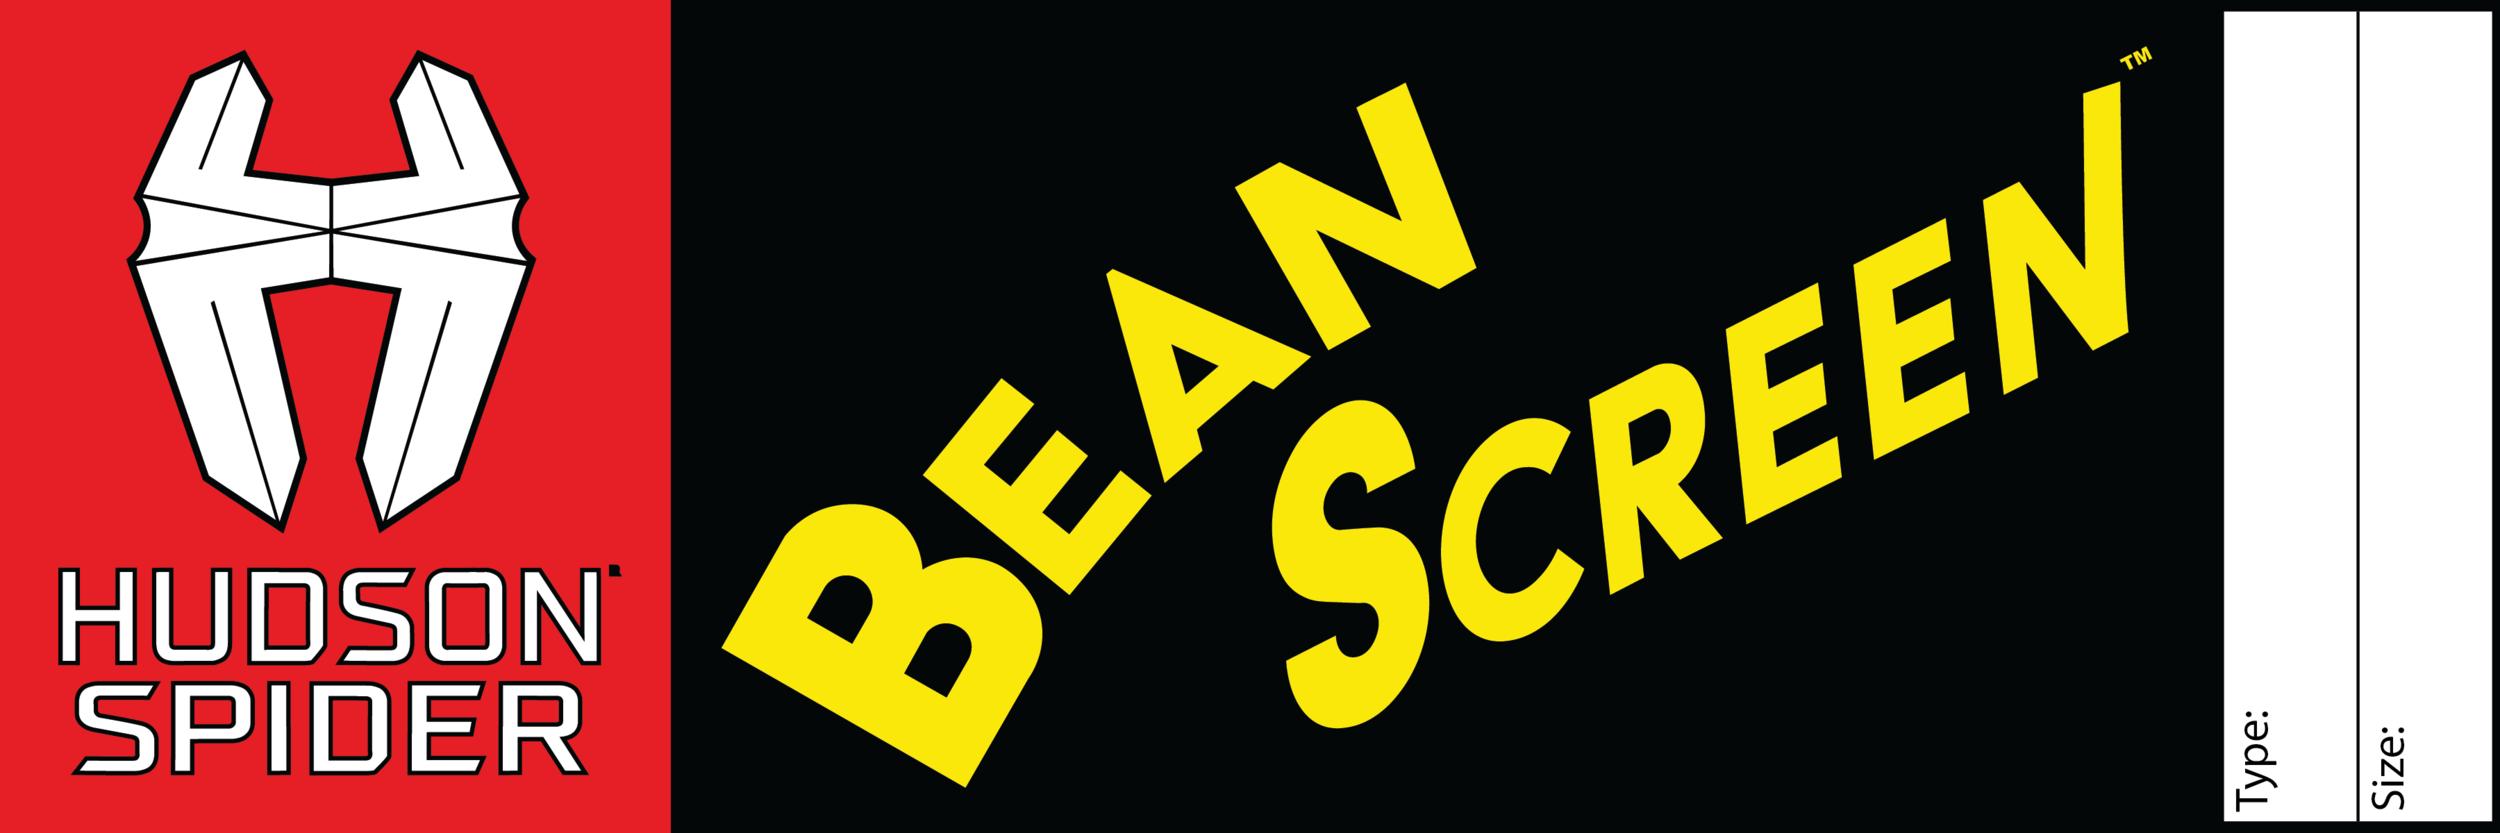 beanscreenlogo.png